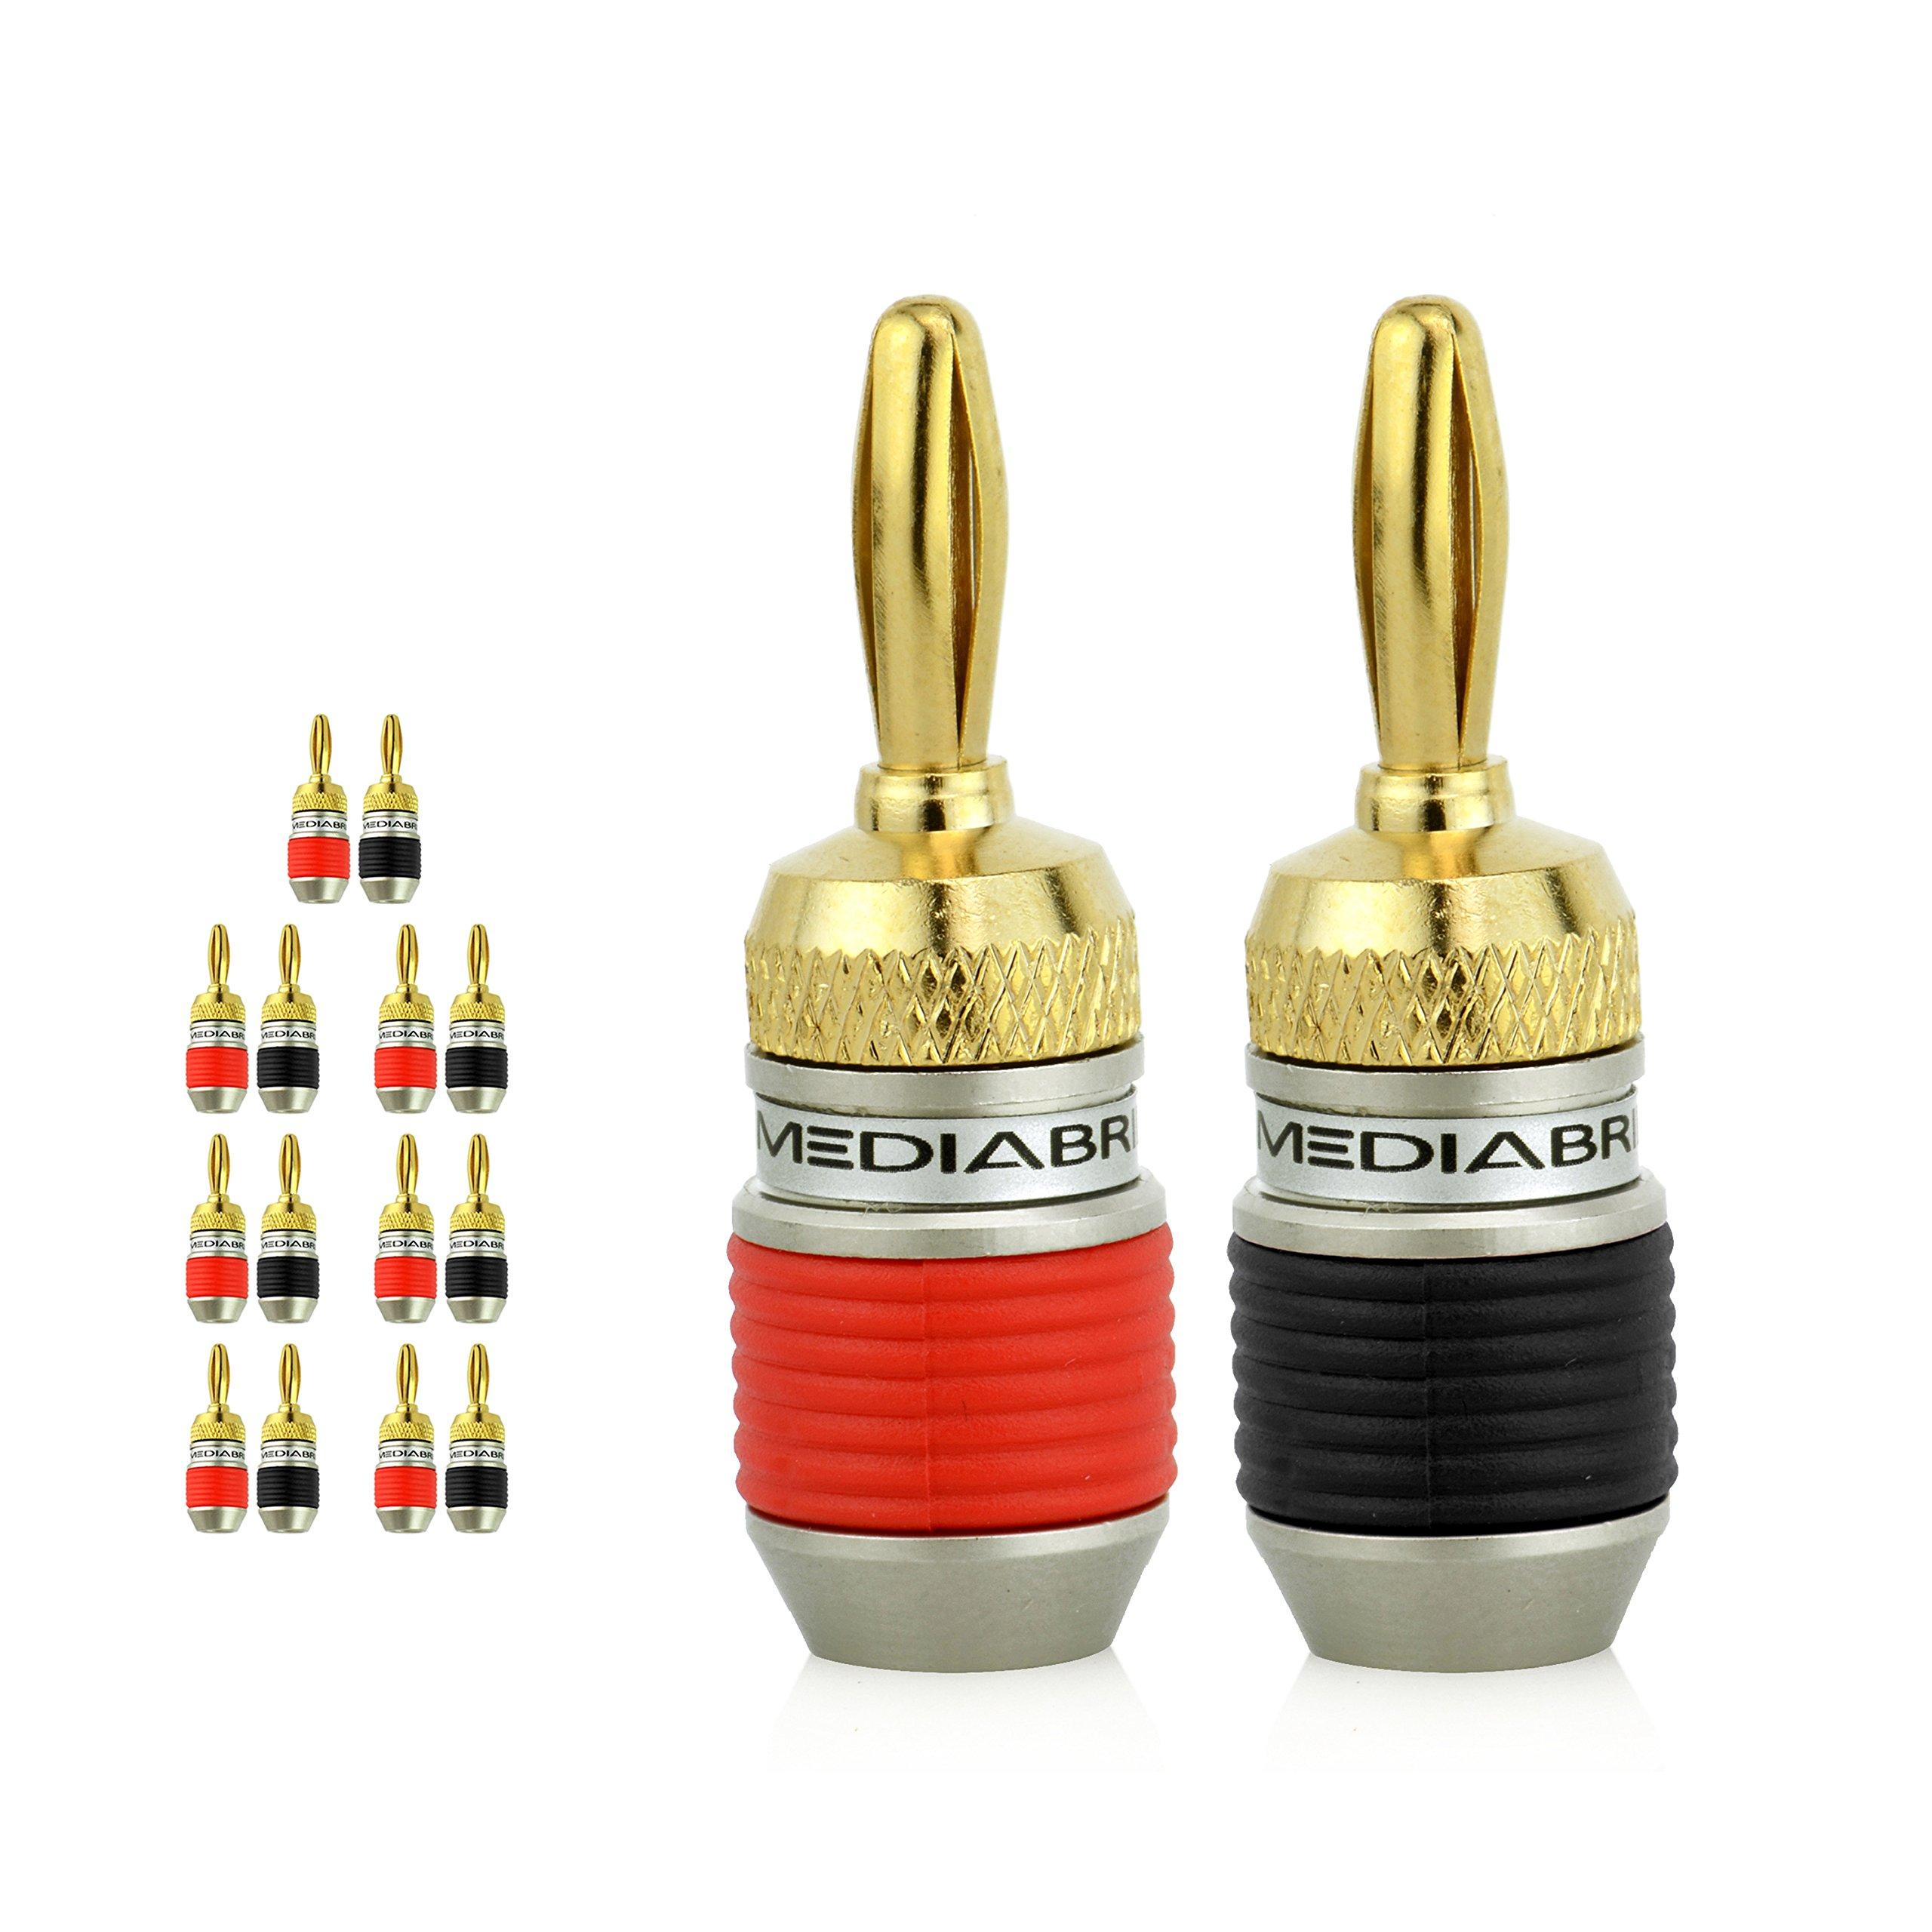 Mediabridge Banana Plugs - Corrosion-Resistant 24K Gold-Plated Connectors - 7 Pair/14 Banana Plugs (Part# SPC-BP2-7 )